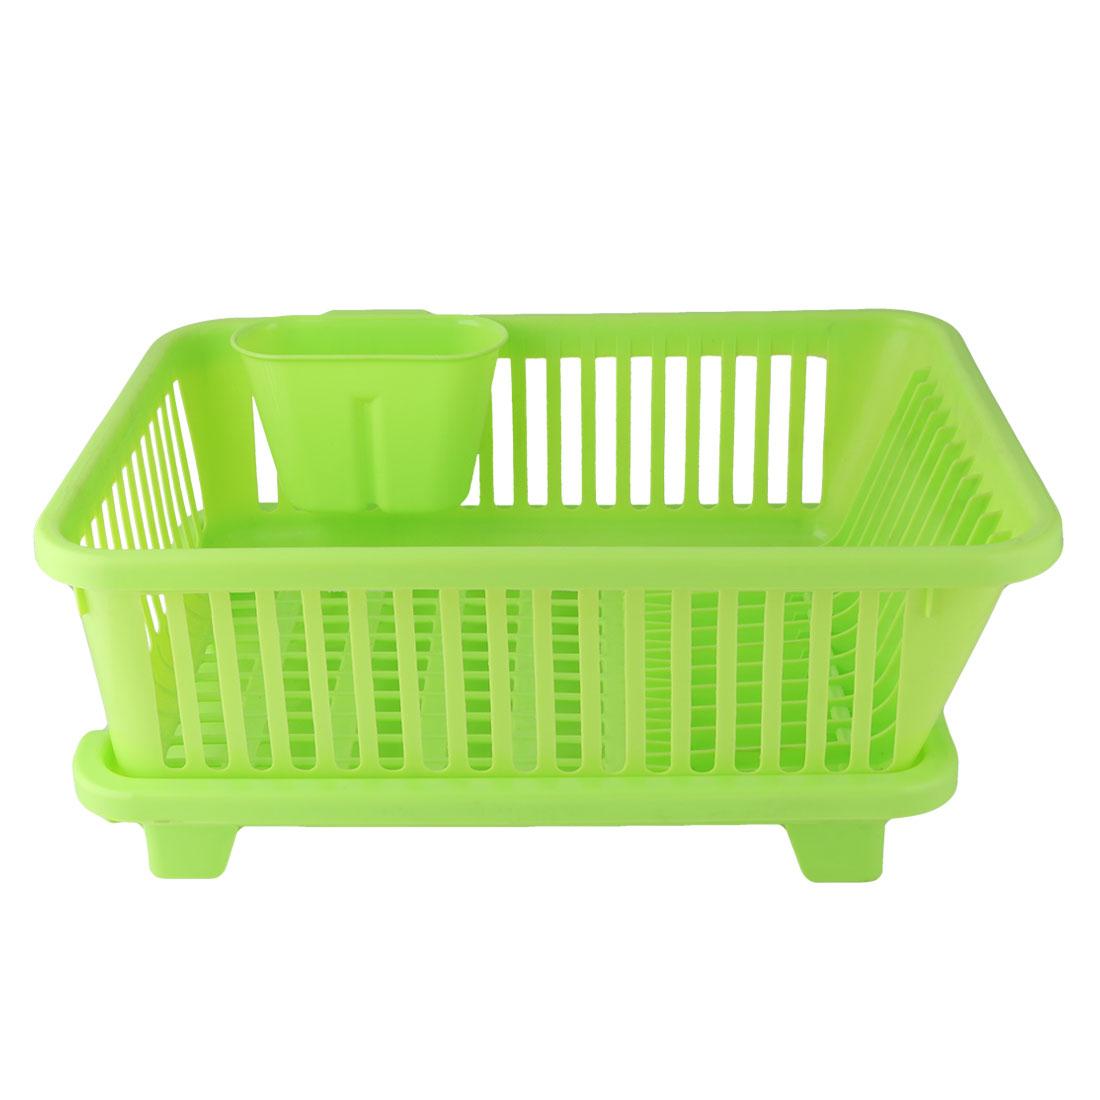 Kitchen Plastic Hollow Out Design Dish Plate Draining Storage Rack Basket Green